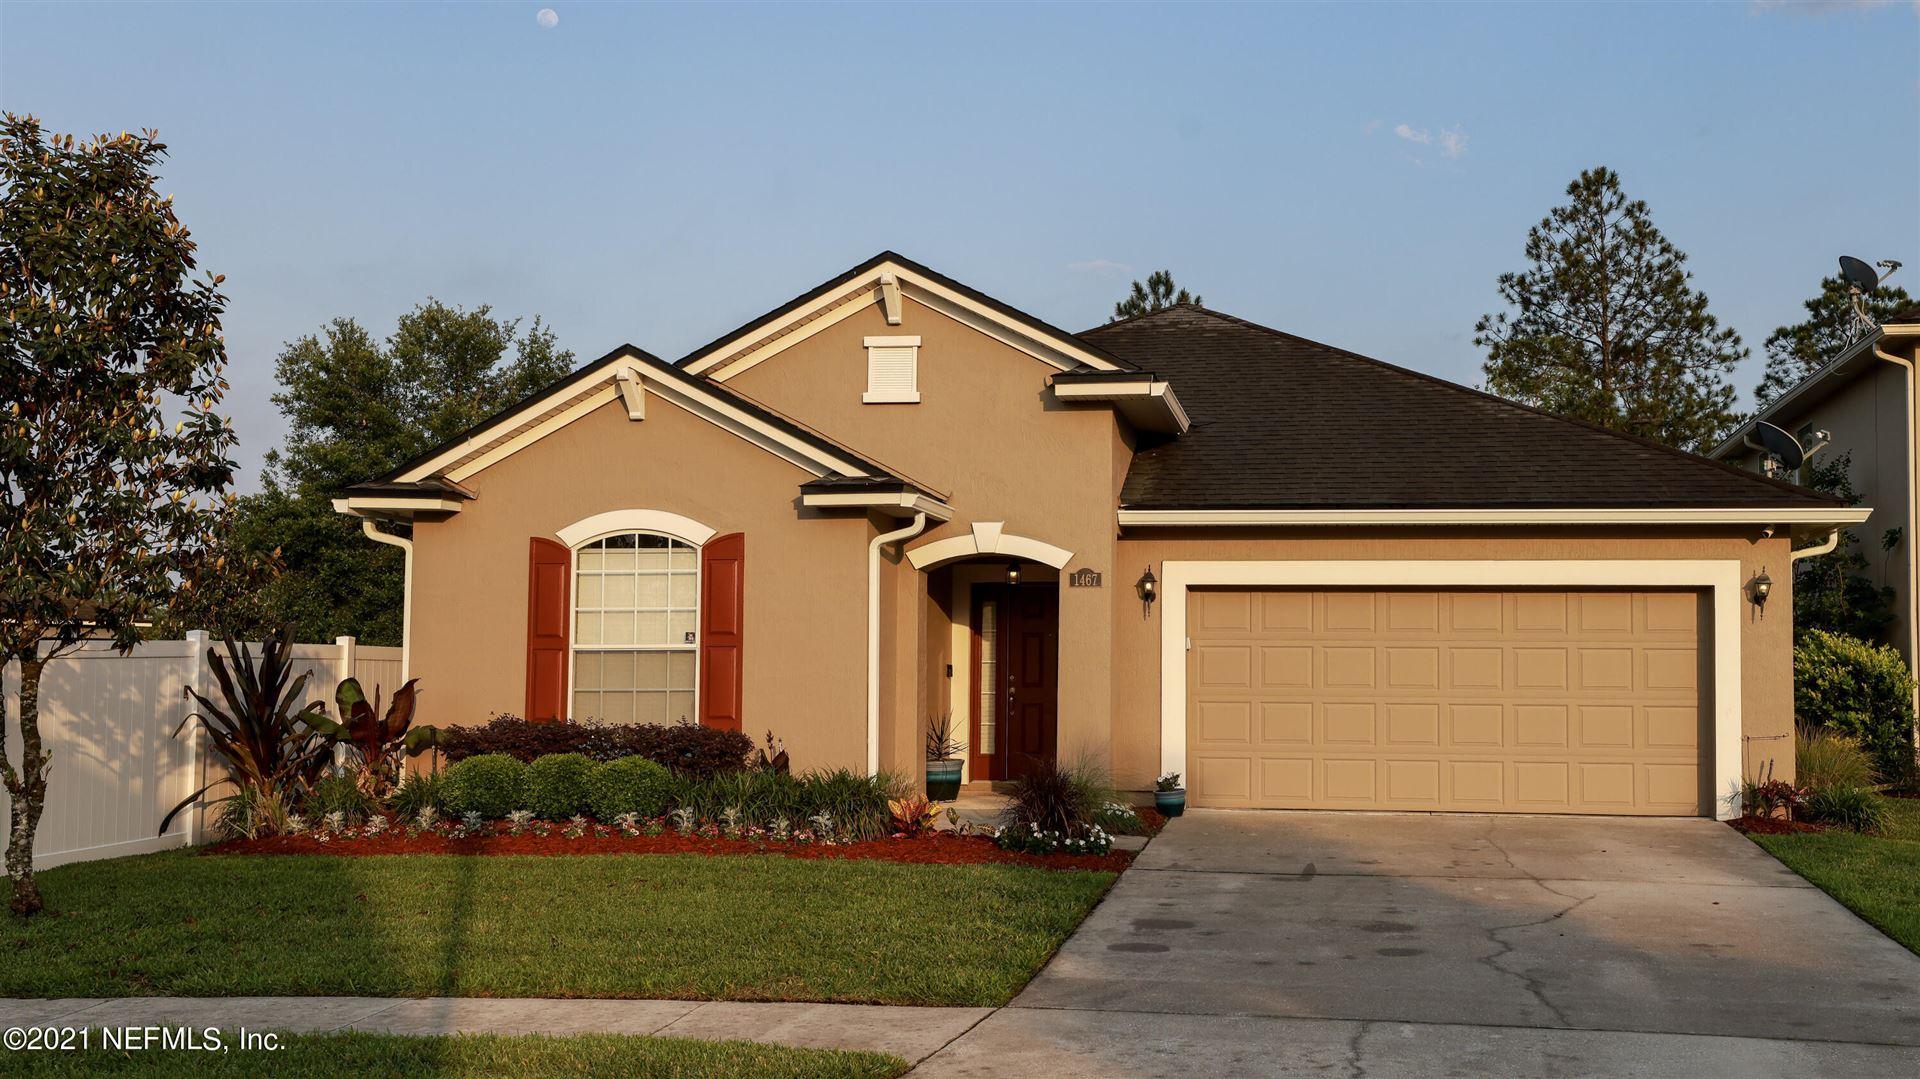 1467 LIMERICK CT, Jacksonville, FL 32221 - MLS#: 1107682